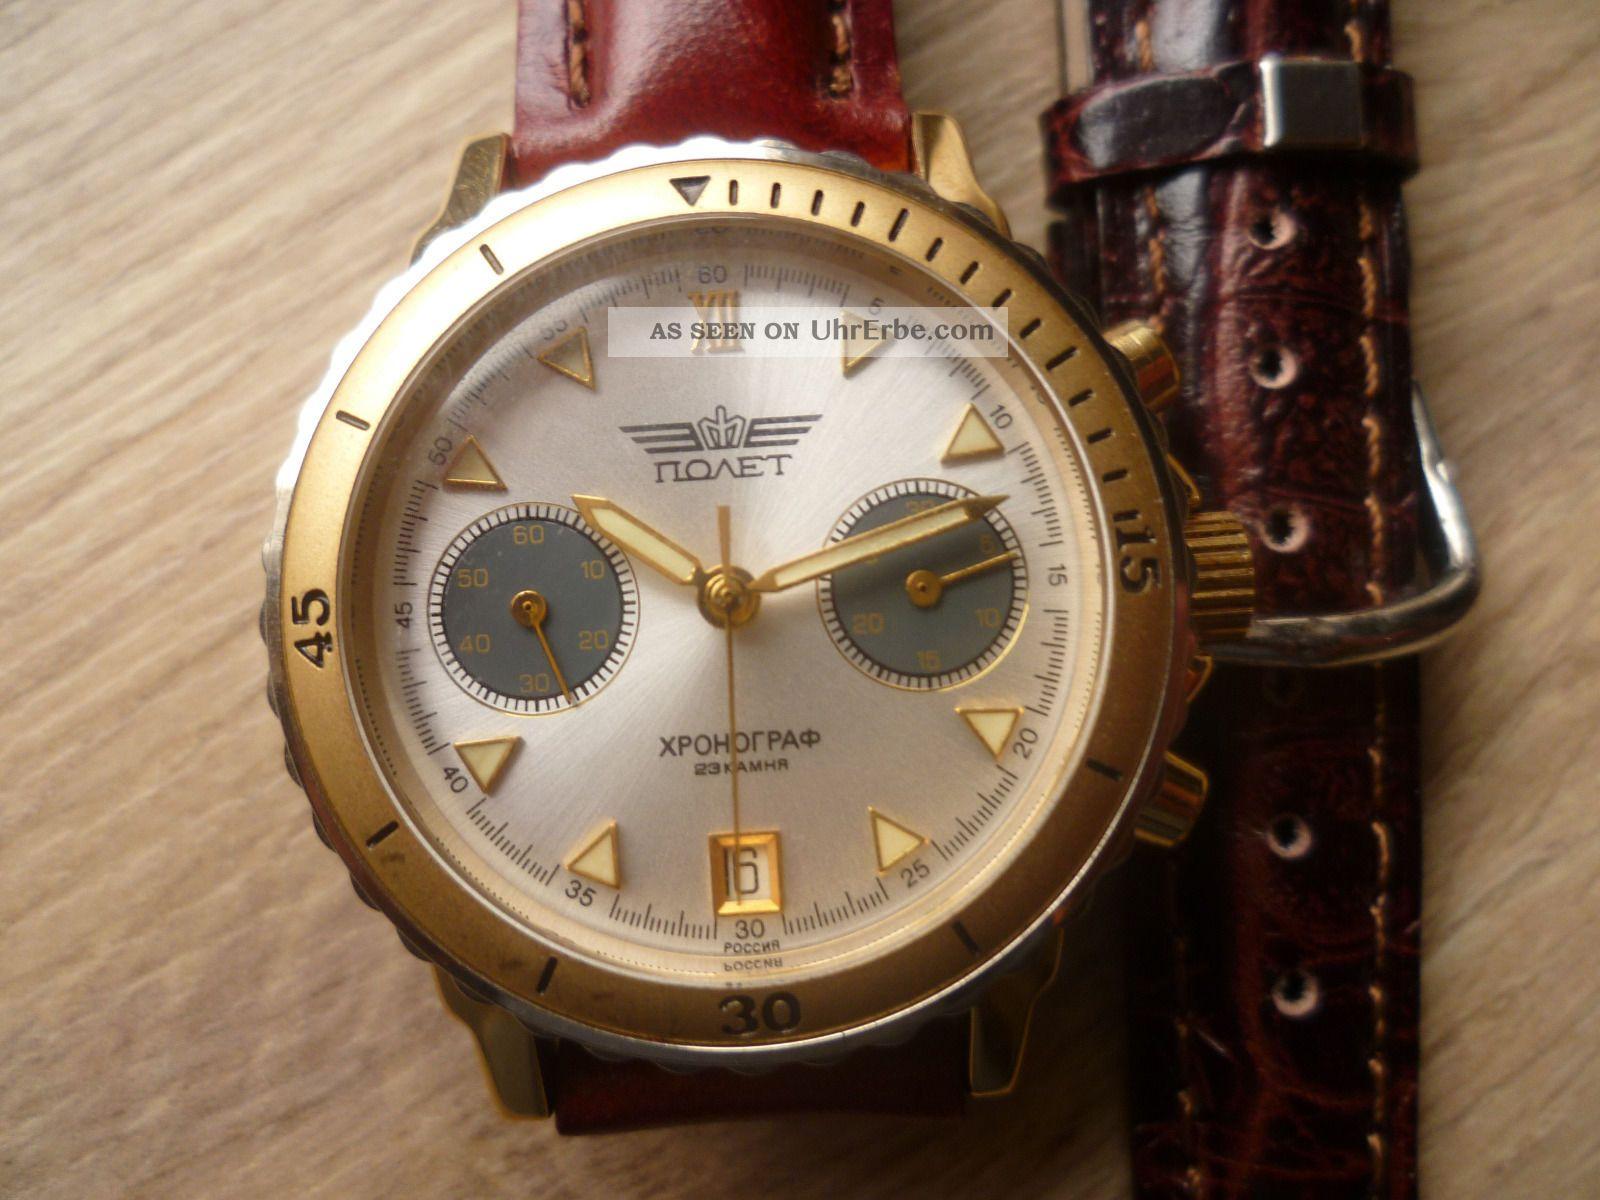 Sehr Schöner Poljot Chronograph Armbanduhren Bild